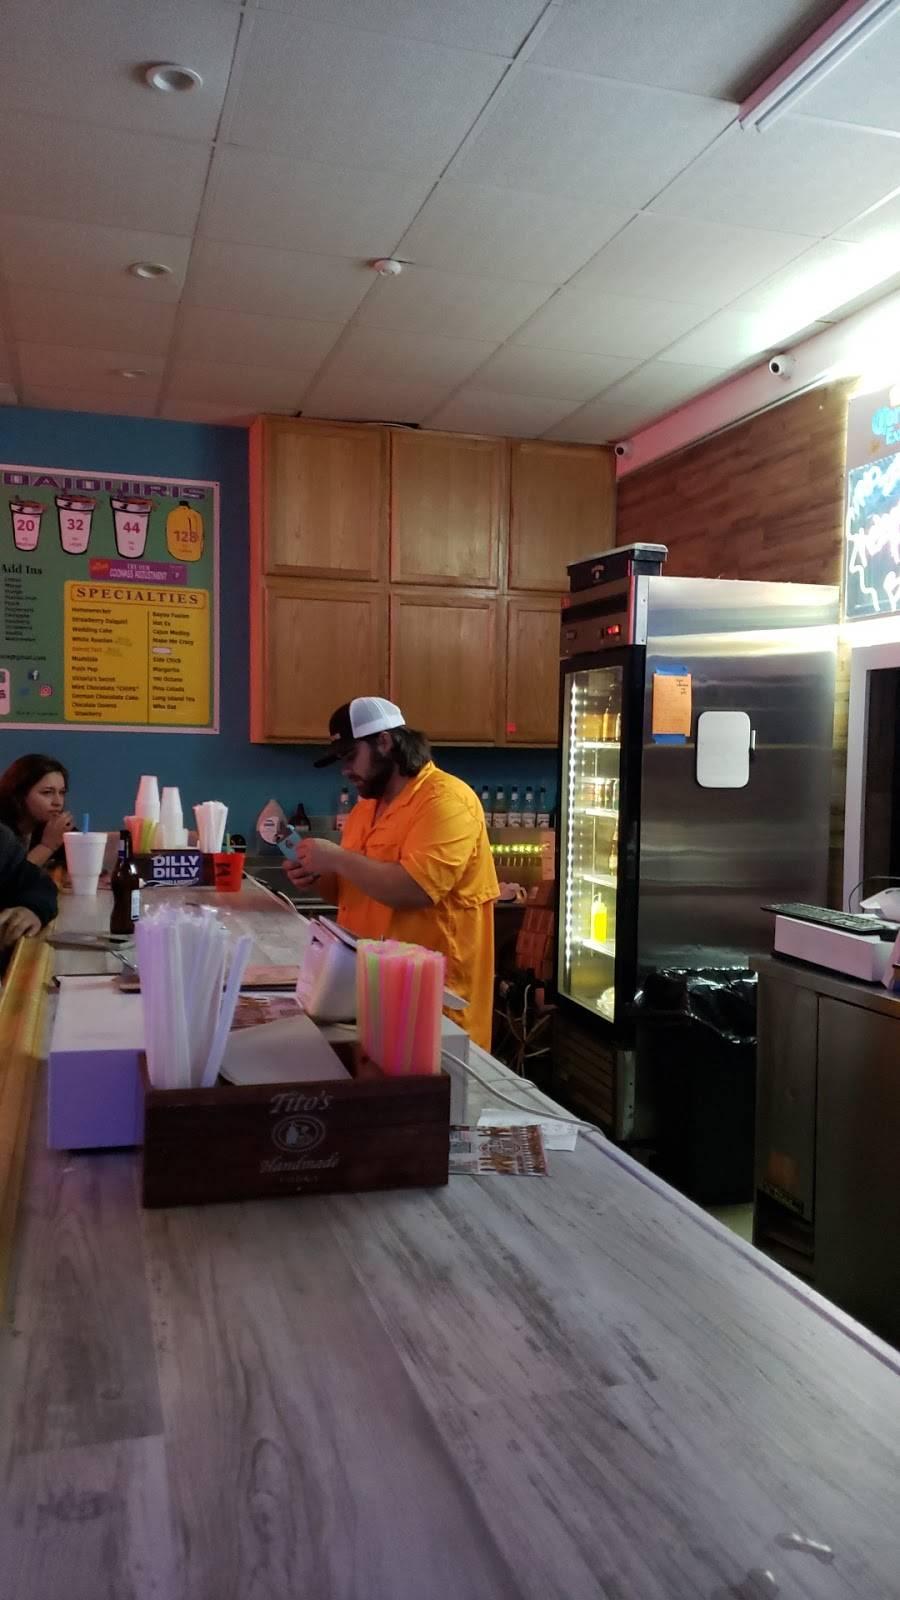 Chips Daiquiris - night club  | Photo 9 of 10 | Address: 38501 State Hwy 42 # D, Prairieville, LA 70769, USA | Phone: (225) 673-6300